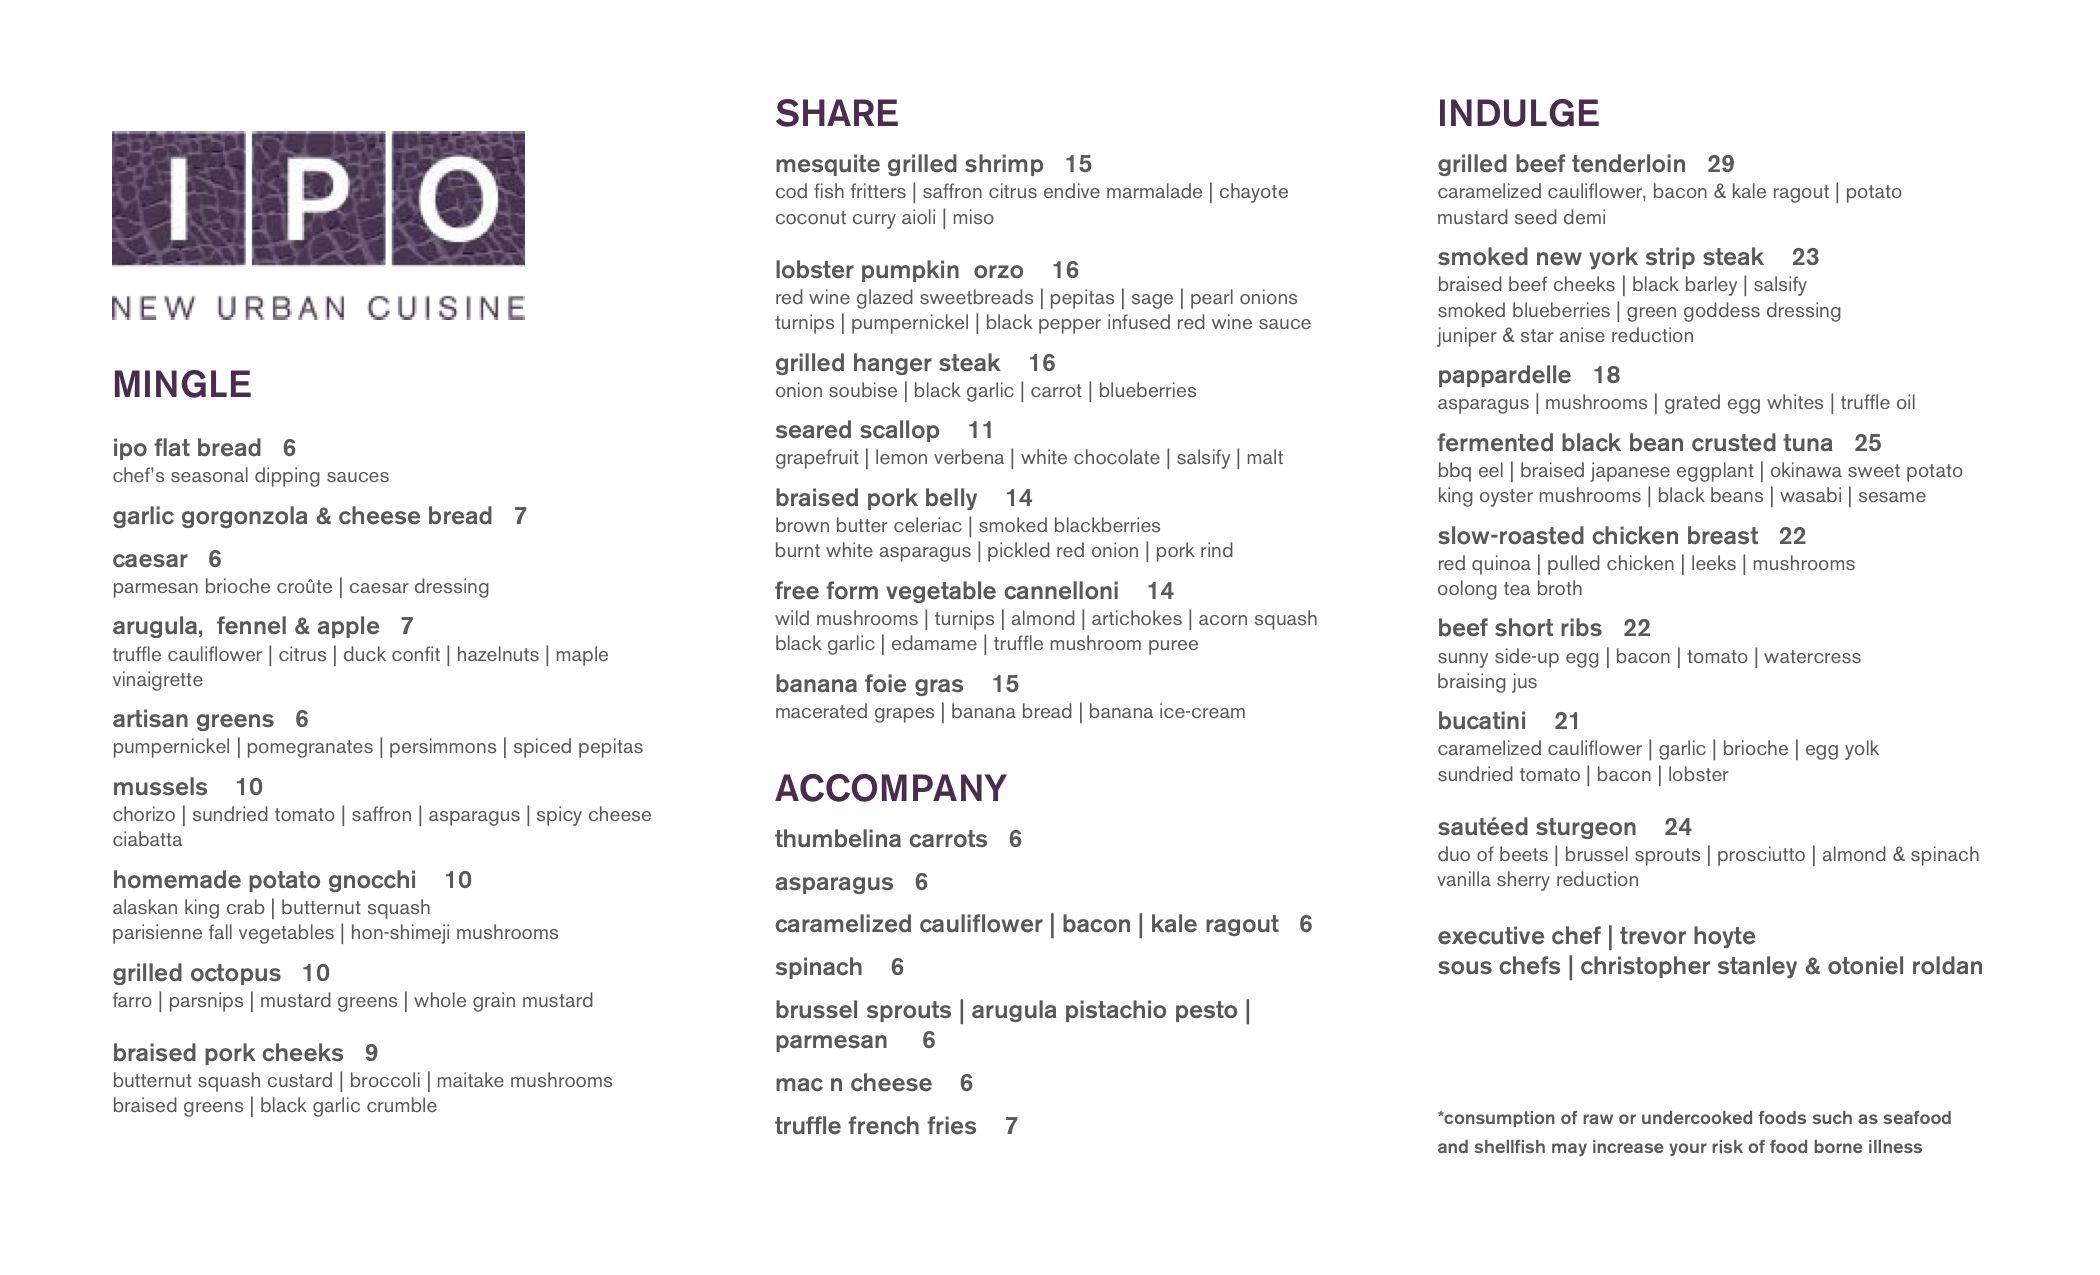 menu layout. Three column horizontal is obviously where I tend to ...